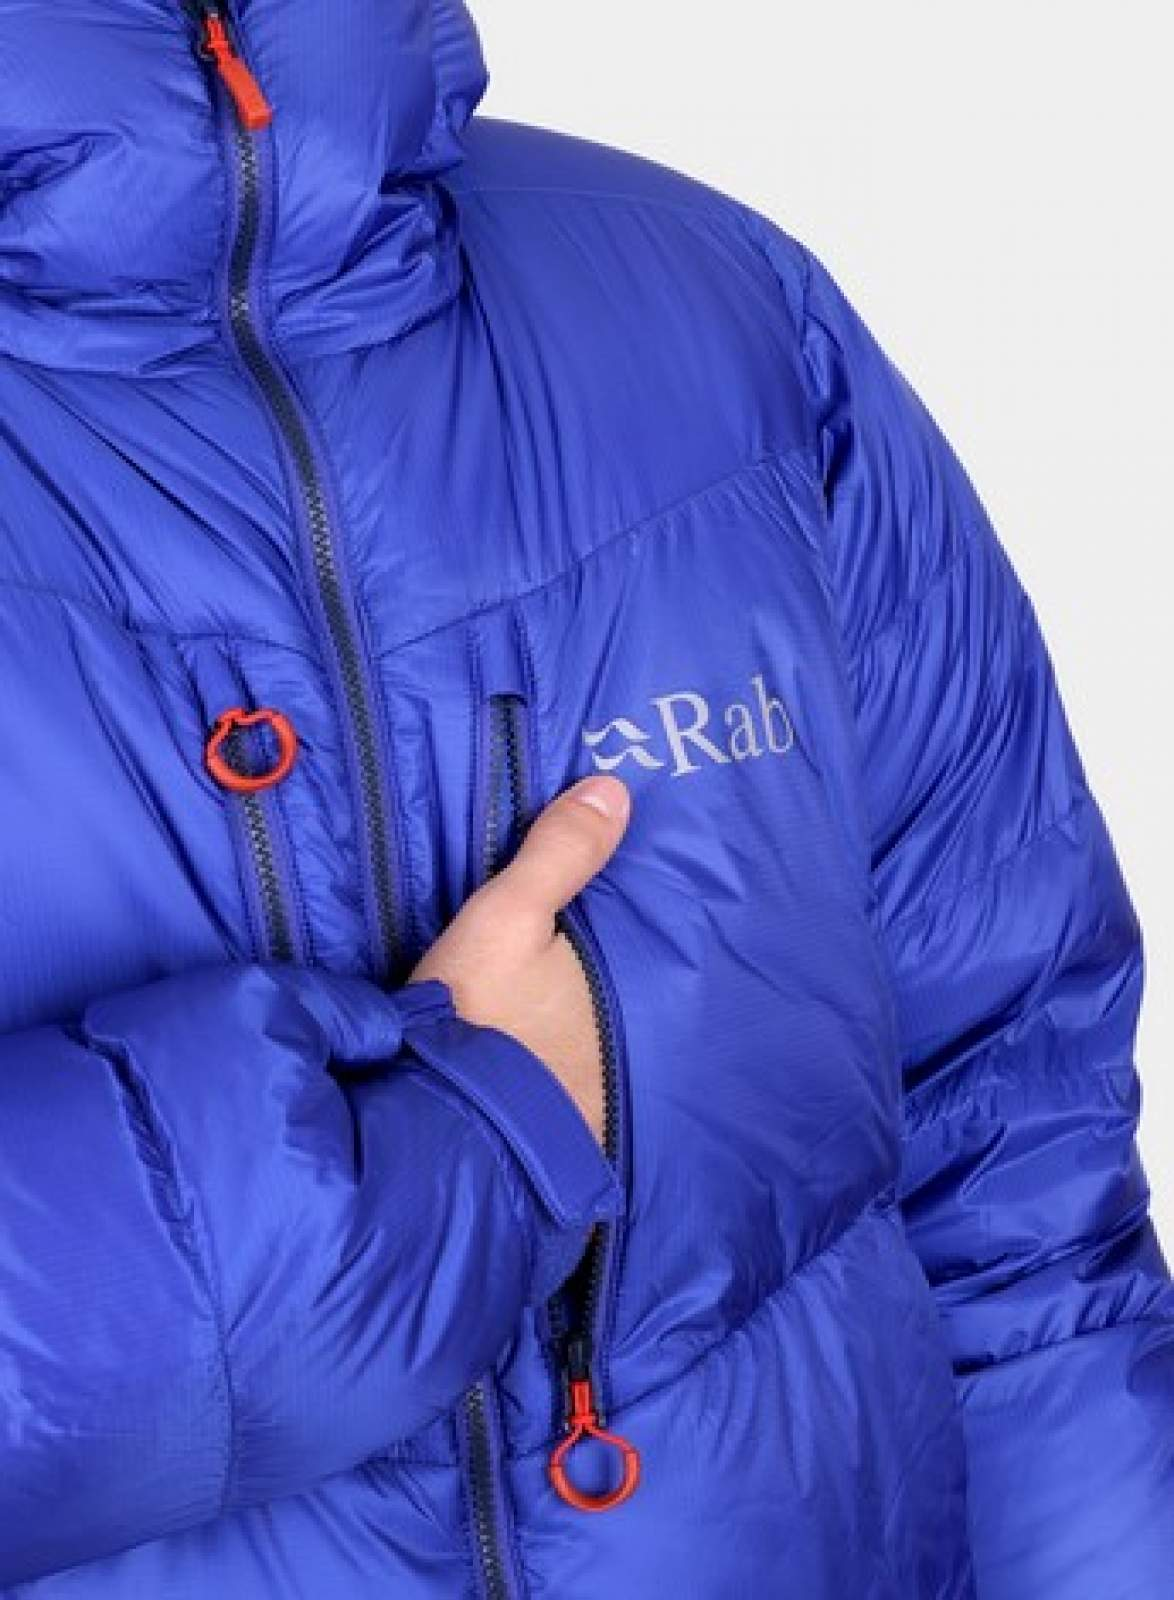 c63c8bc1 Rab Куртка Rab Expedition 7000 Jkt Муж. – купить в магазине НОМАД ...